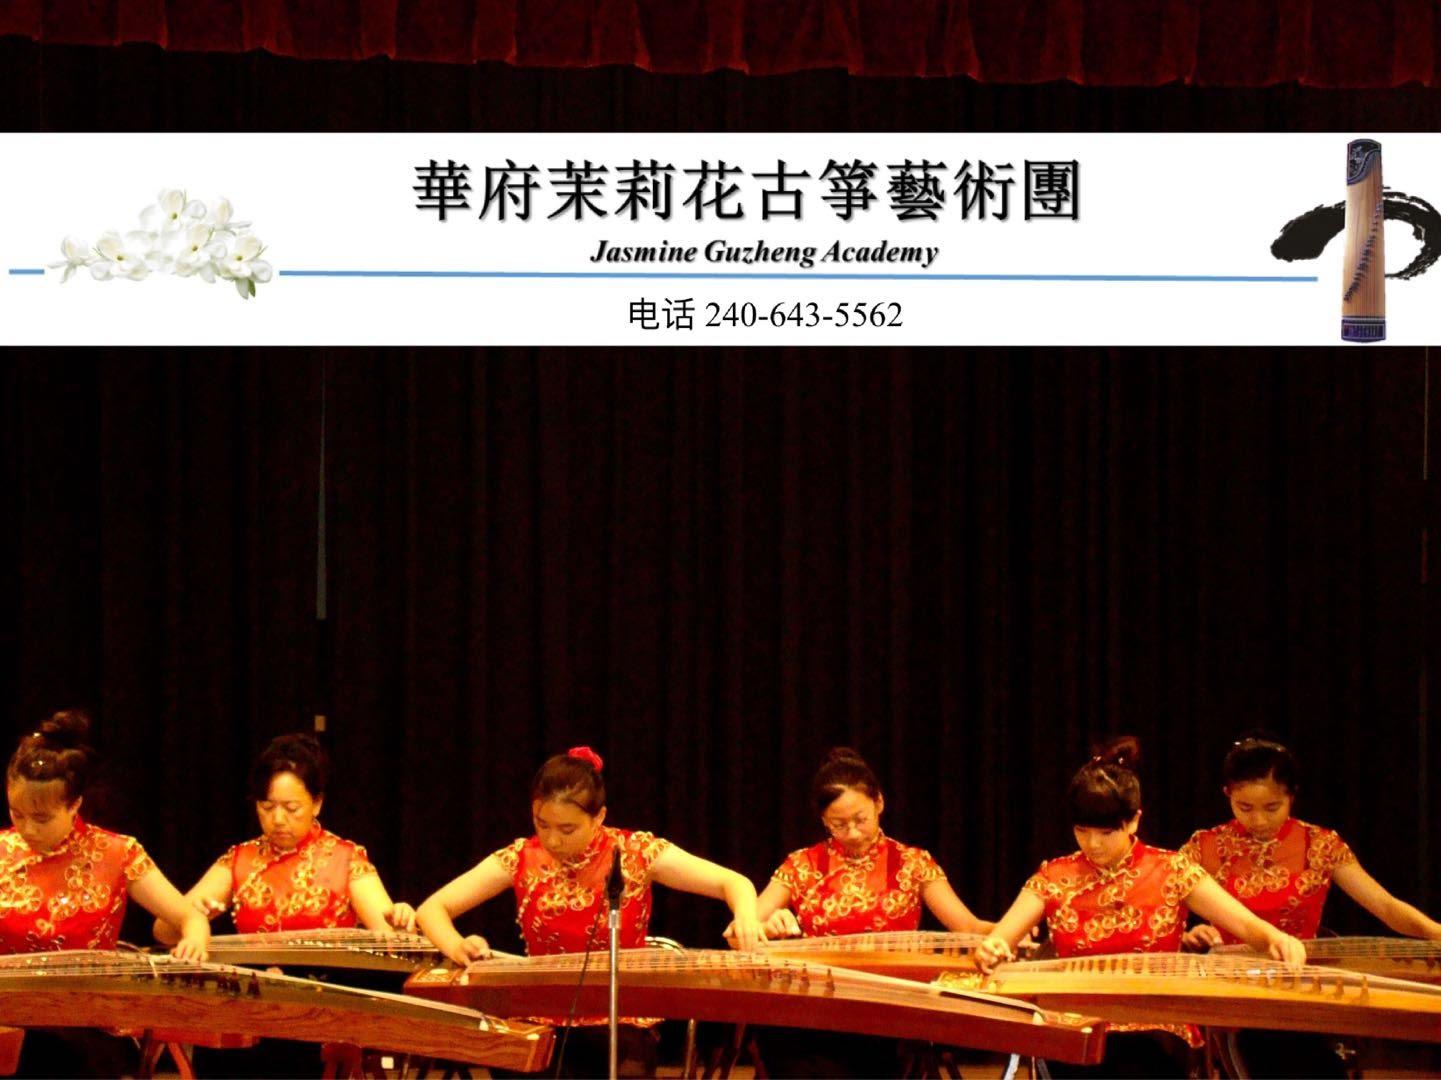 http://www.cinfoshare.org/activities/music/jasmine-guzheng-academy